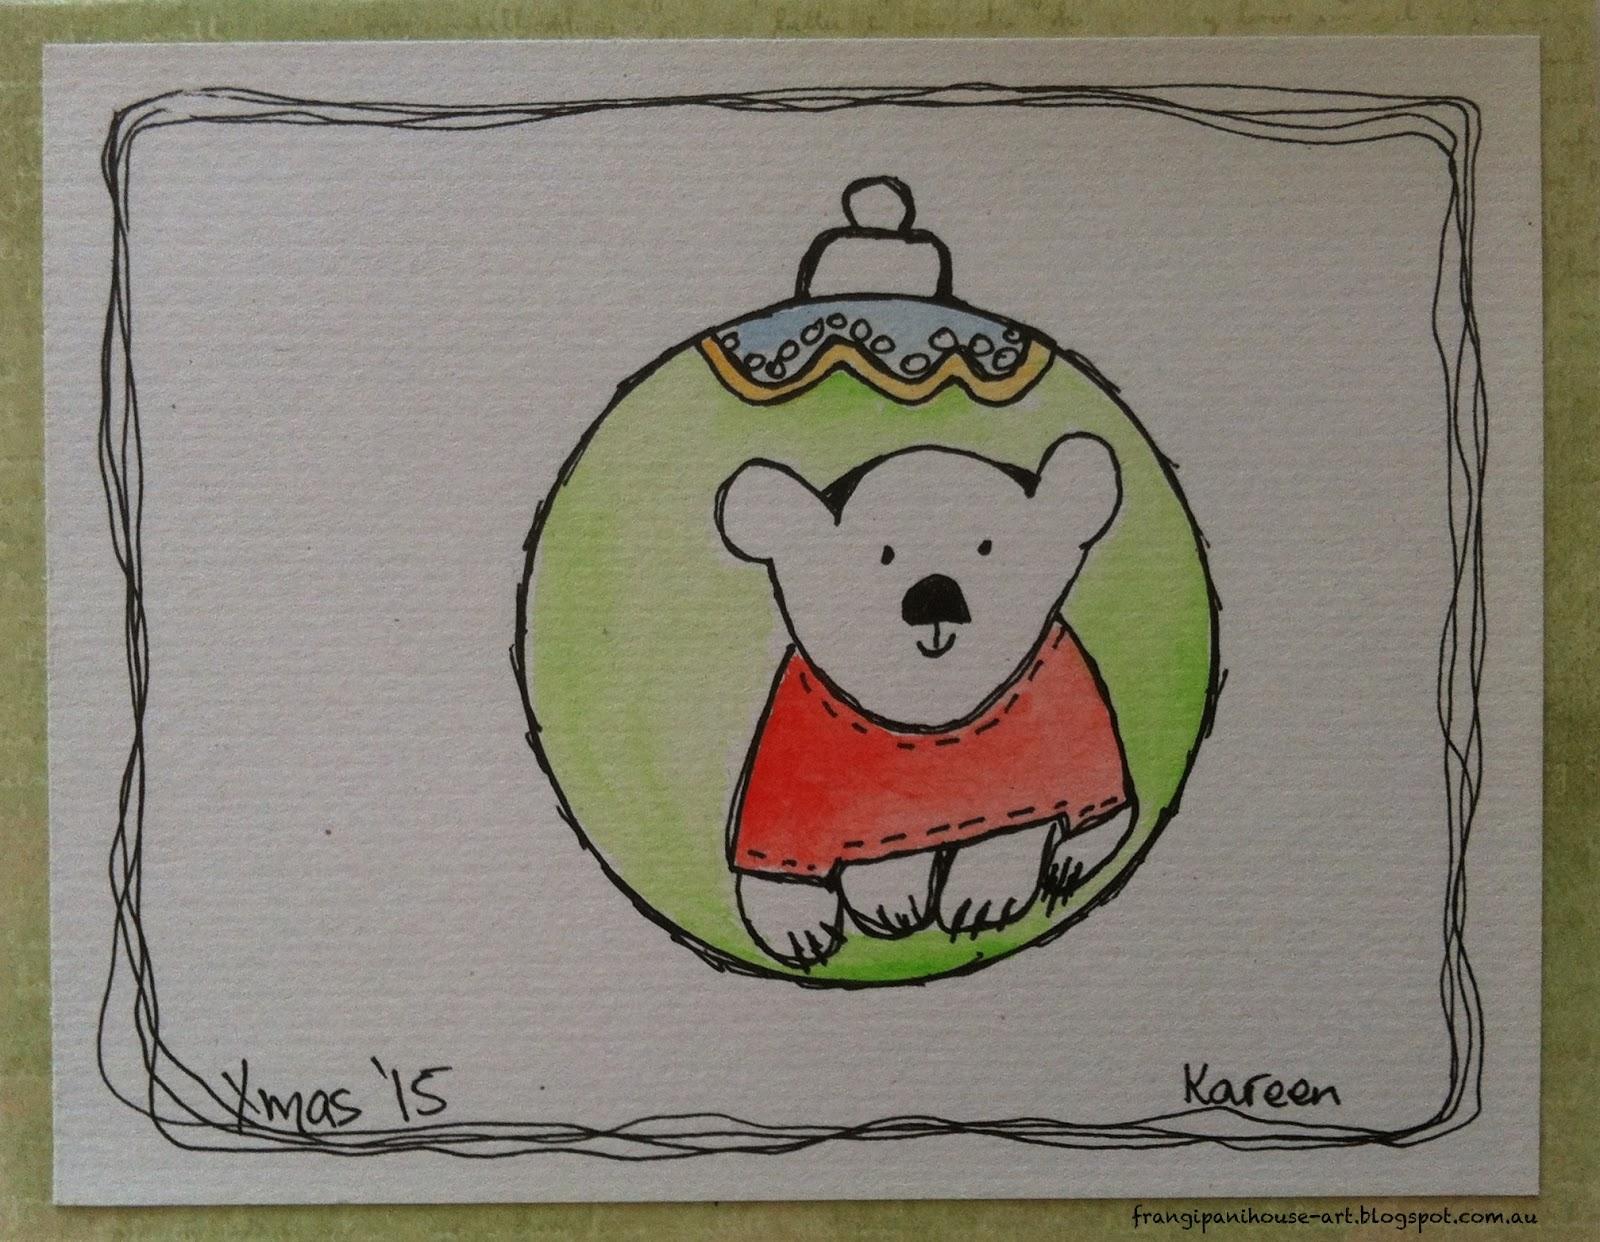 Frangipani House Art Studio Blog December 2 Xmas Bauble Bear Doodle